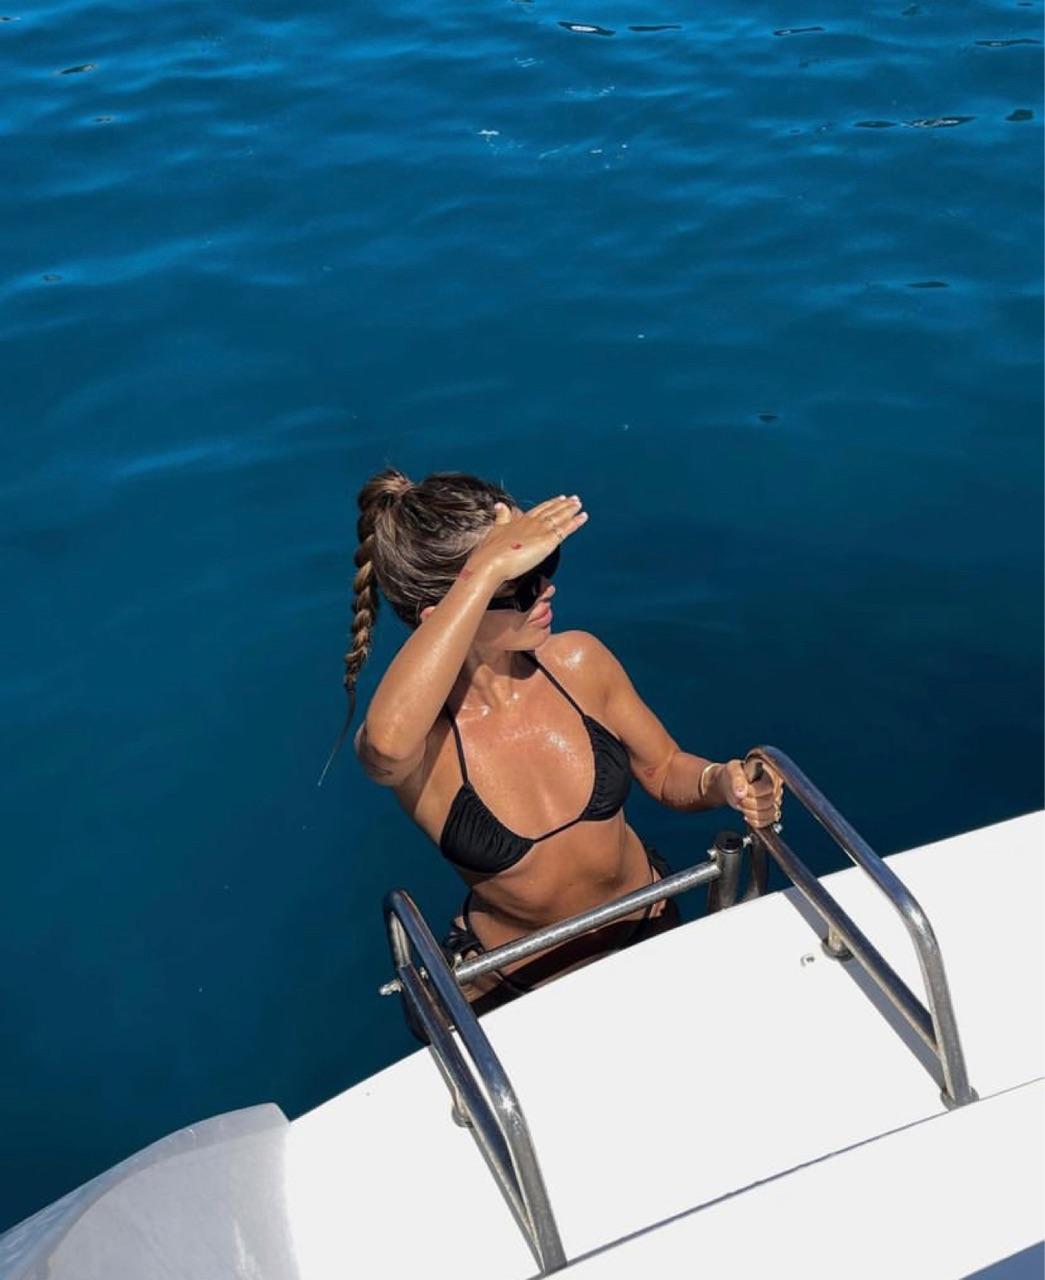 bikini, inspiration, and ocean image